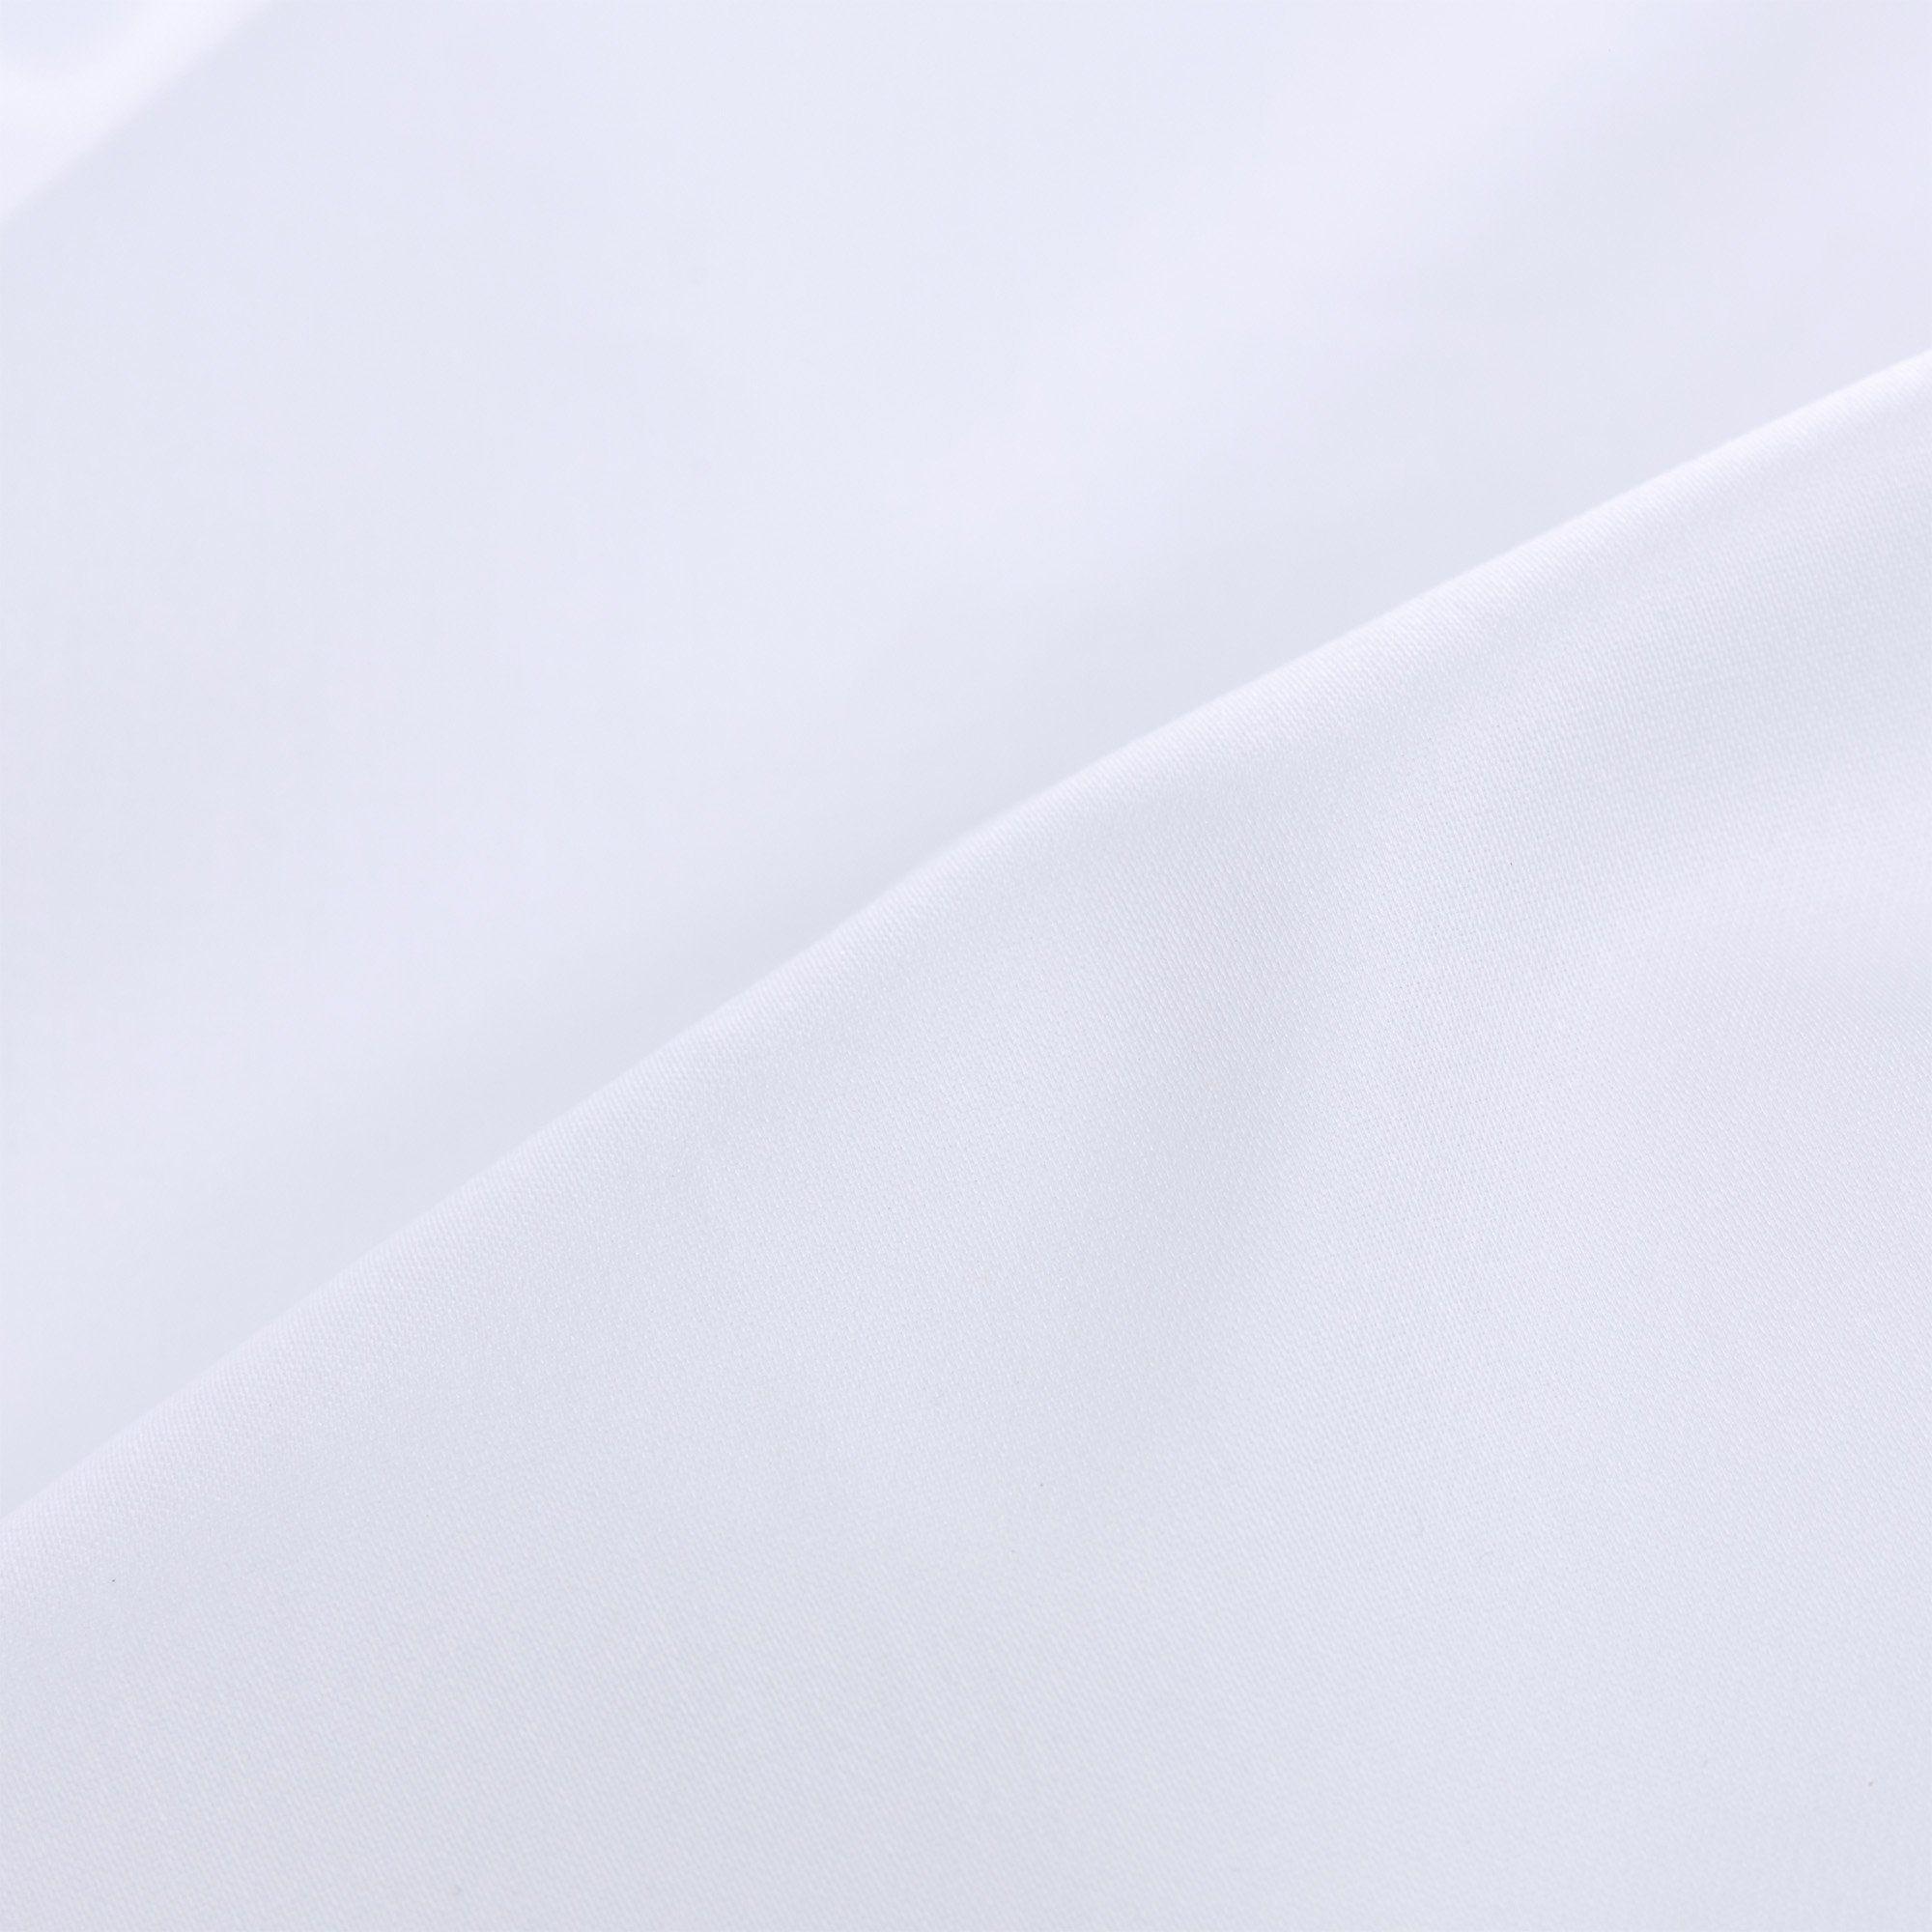 Satin Spannbettlaken Vivy Weiss 140x200 Cm Hidden